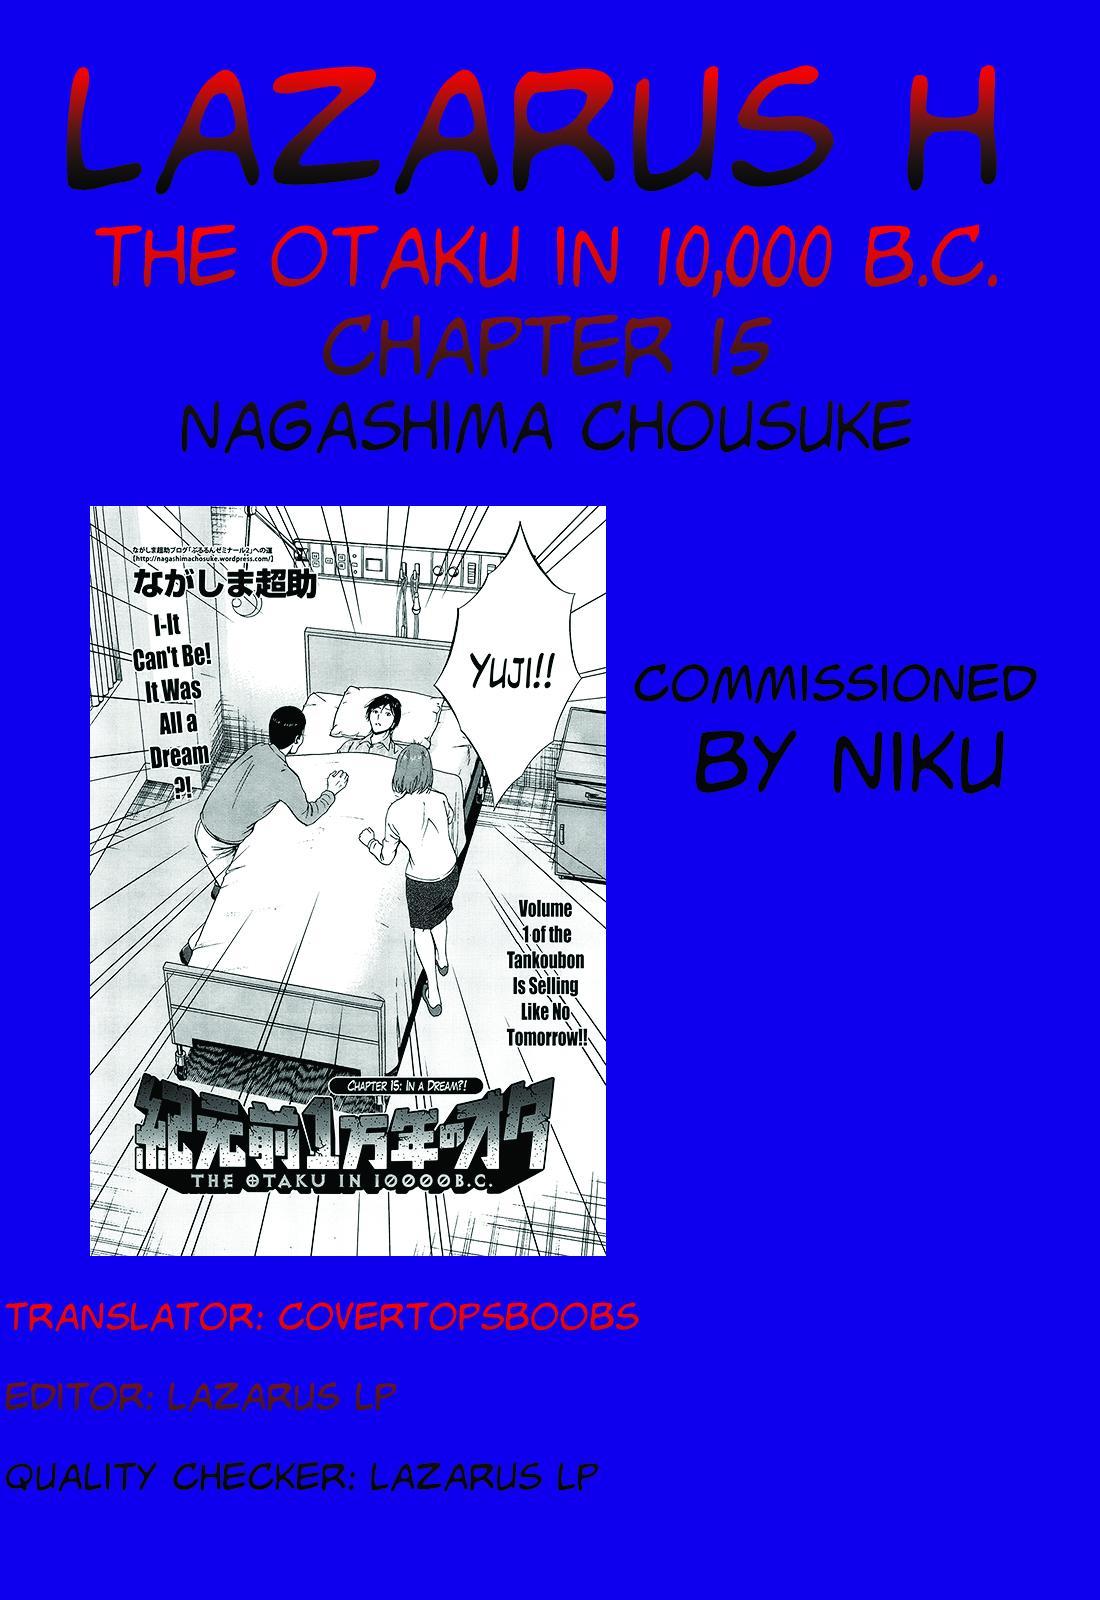 Kigenzen 10000 Nen no Ota   The Otaku in 10,000 B.C. Ch. 1-22 289